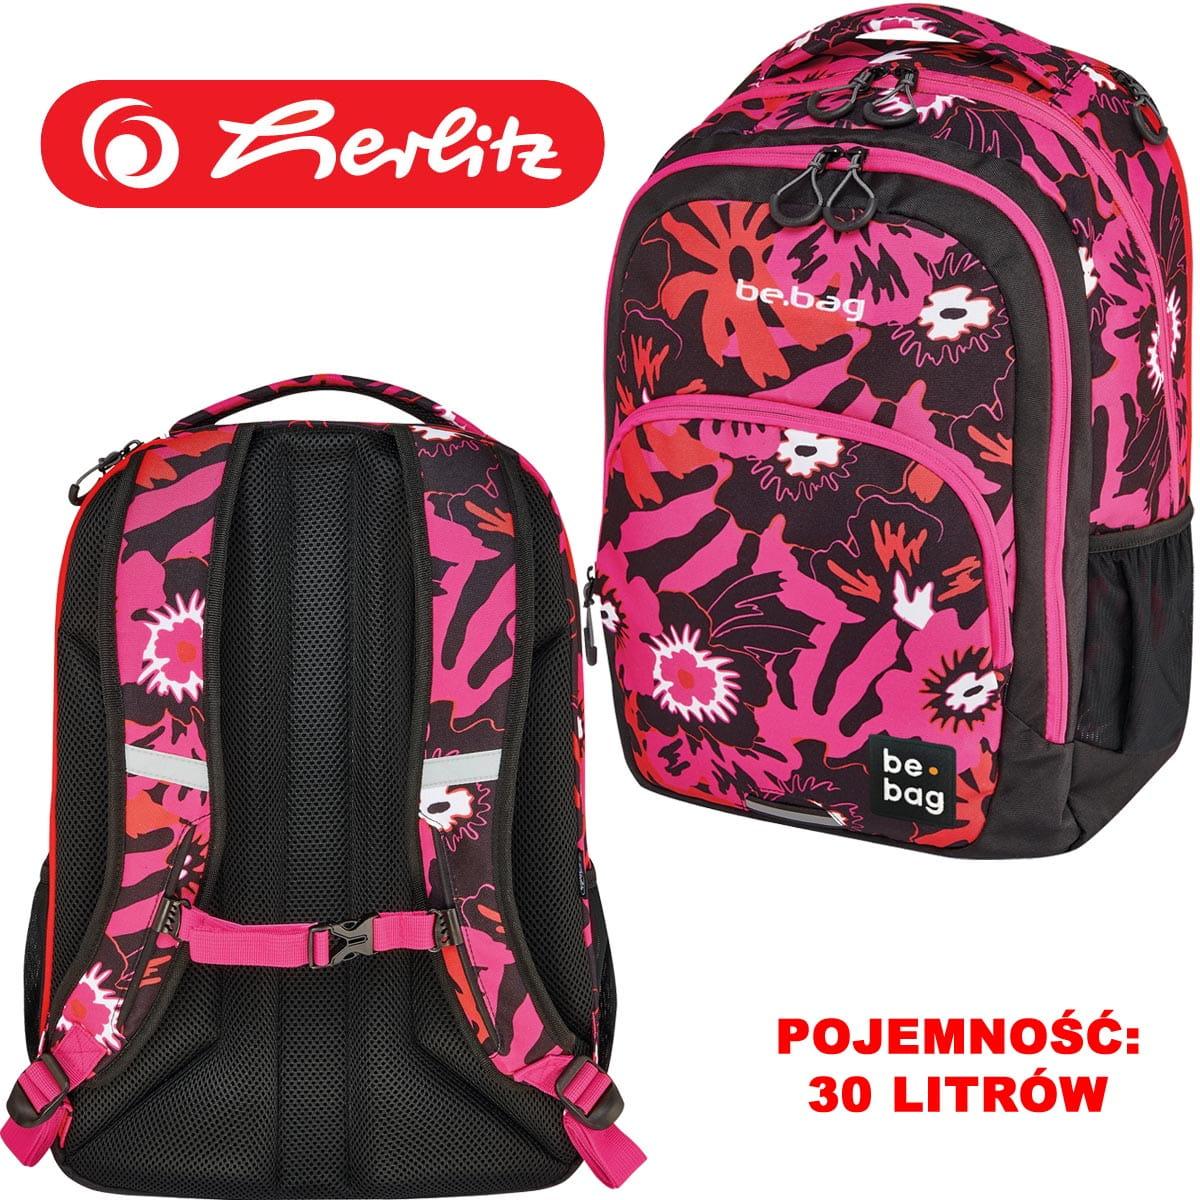 8a049017784f9 24800280_plecak_szkolny_młodzieżowy_Herlitz  be_bag_Be_Ready_motyw_Pink_Summer_a.jpg ·  24800280_plecak_szkolny_młodzieżowy_Herlitz ...